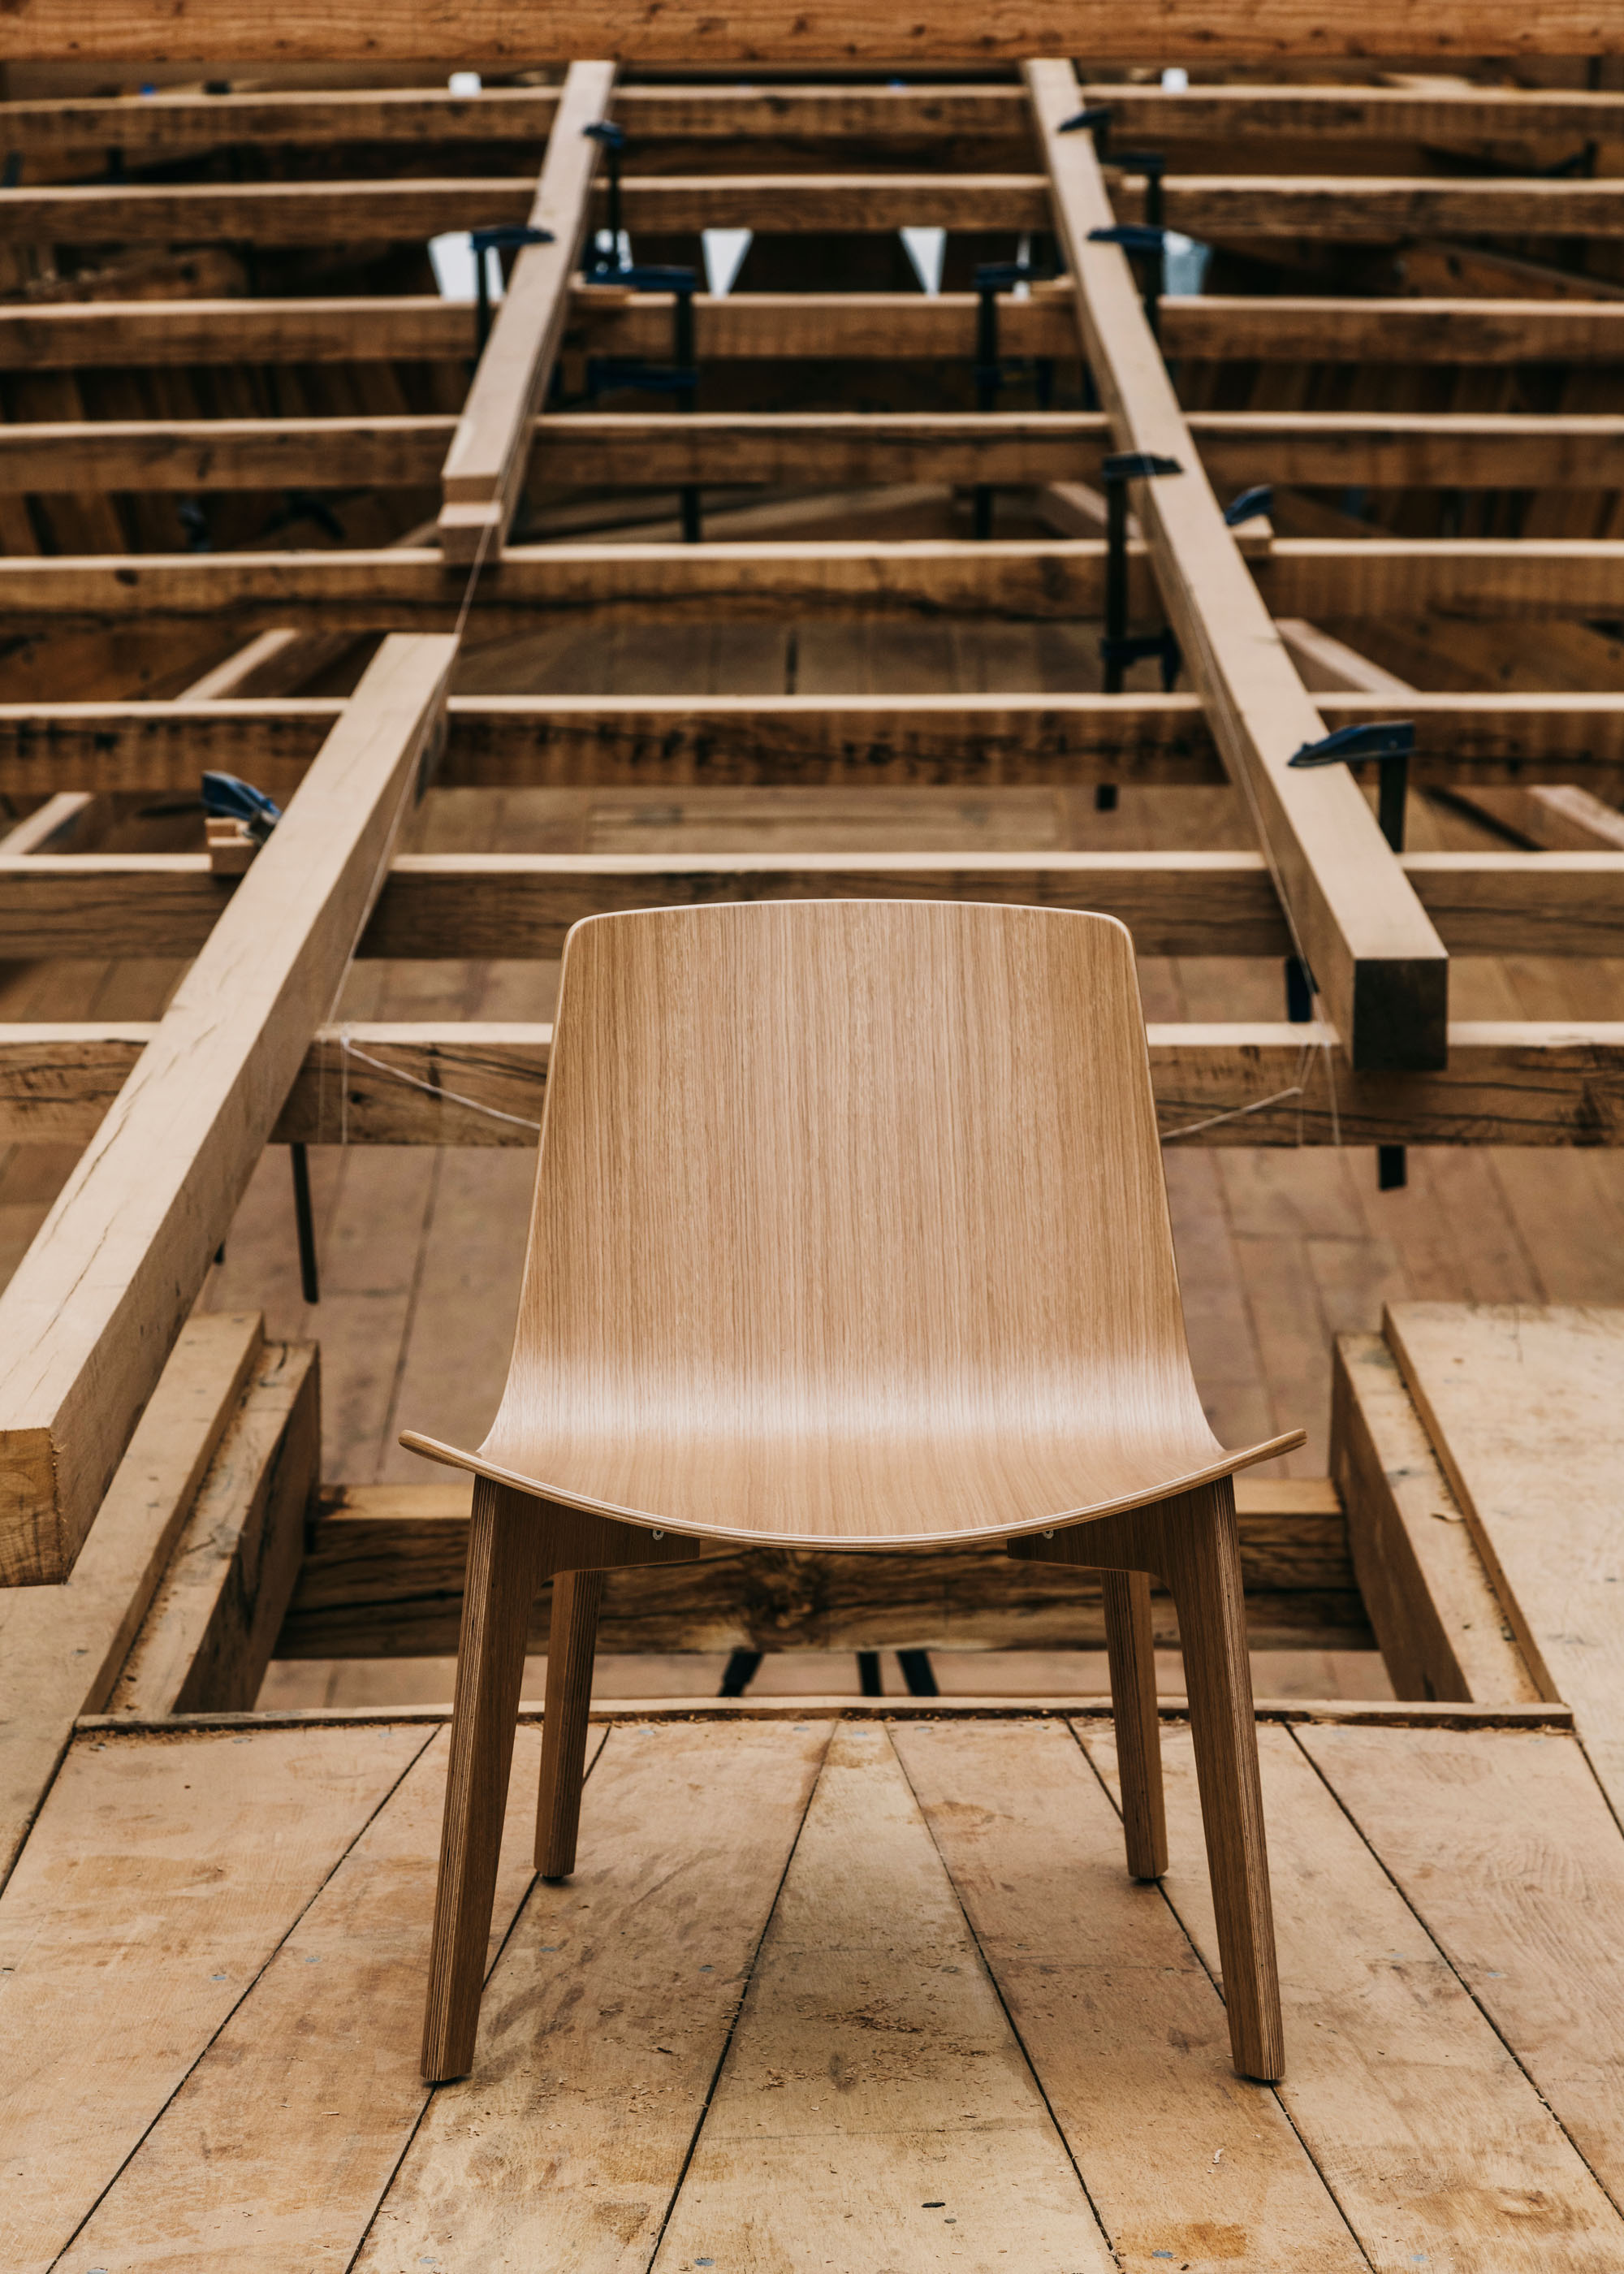 #furniture #enea #design #clase #basque #chairs #wood